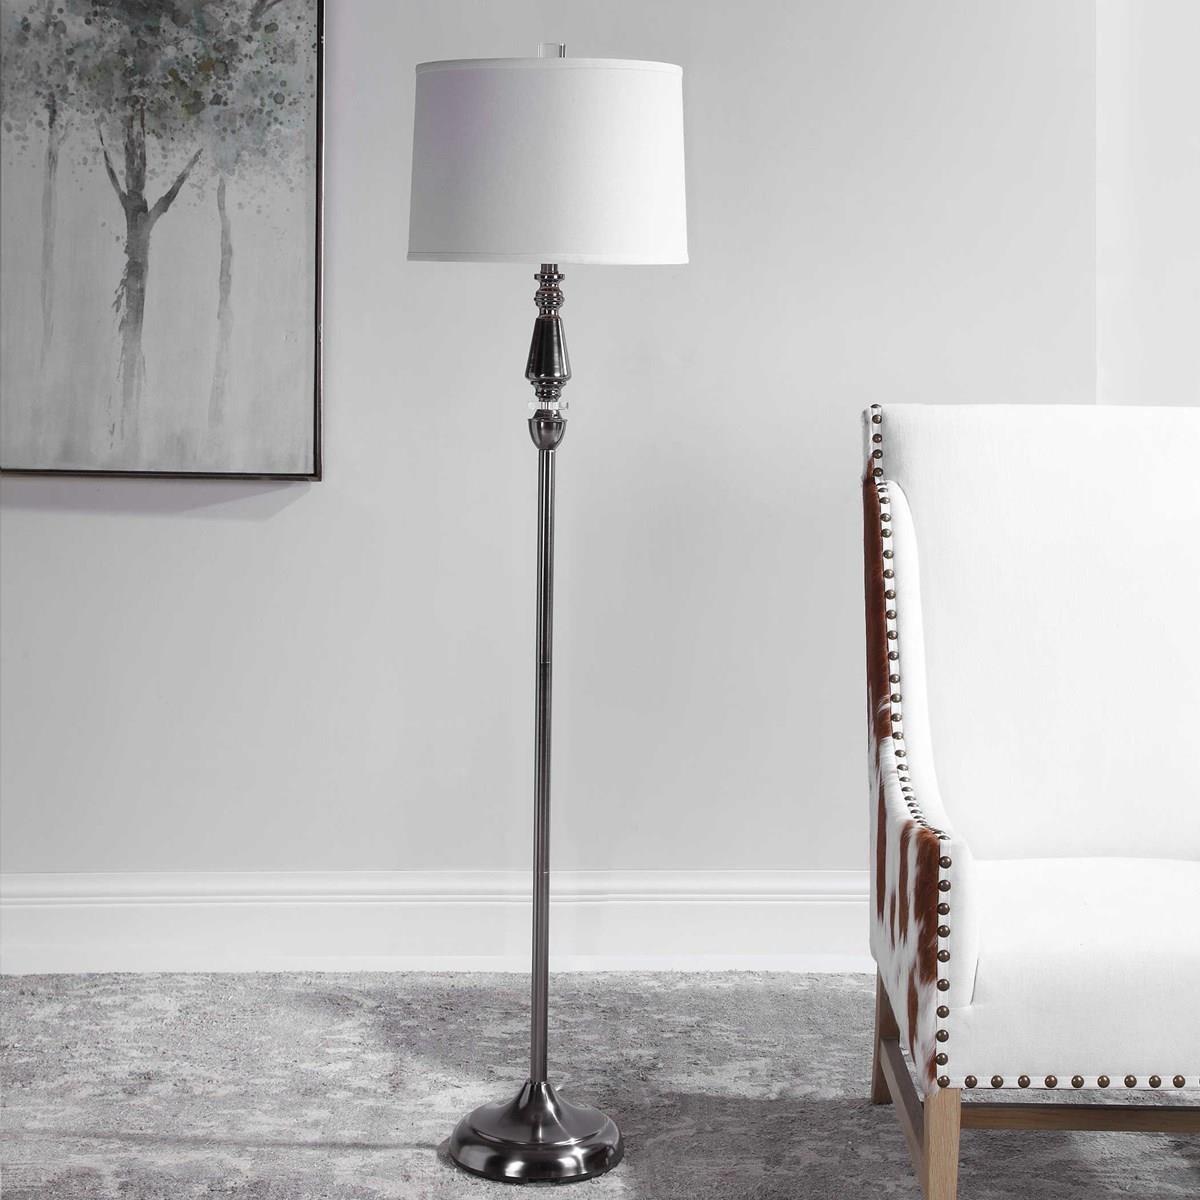 Floor Lamps EMERSYN FLOOR LAMP by Unique at Walker's Furniture